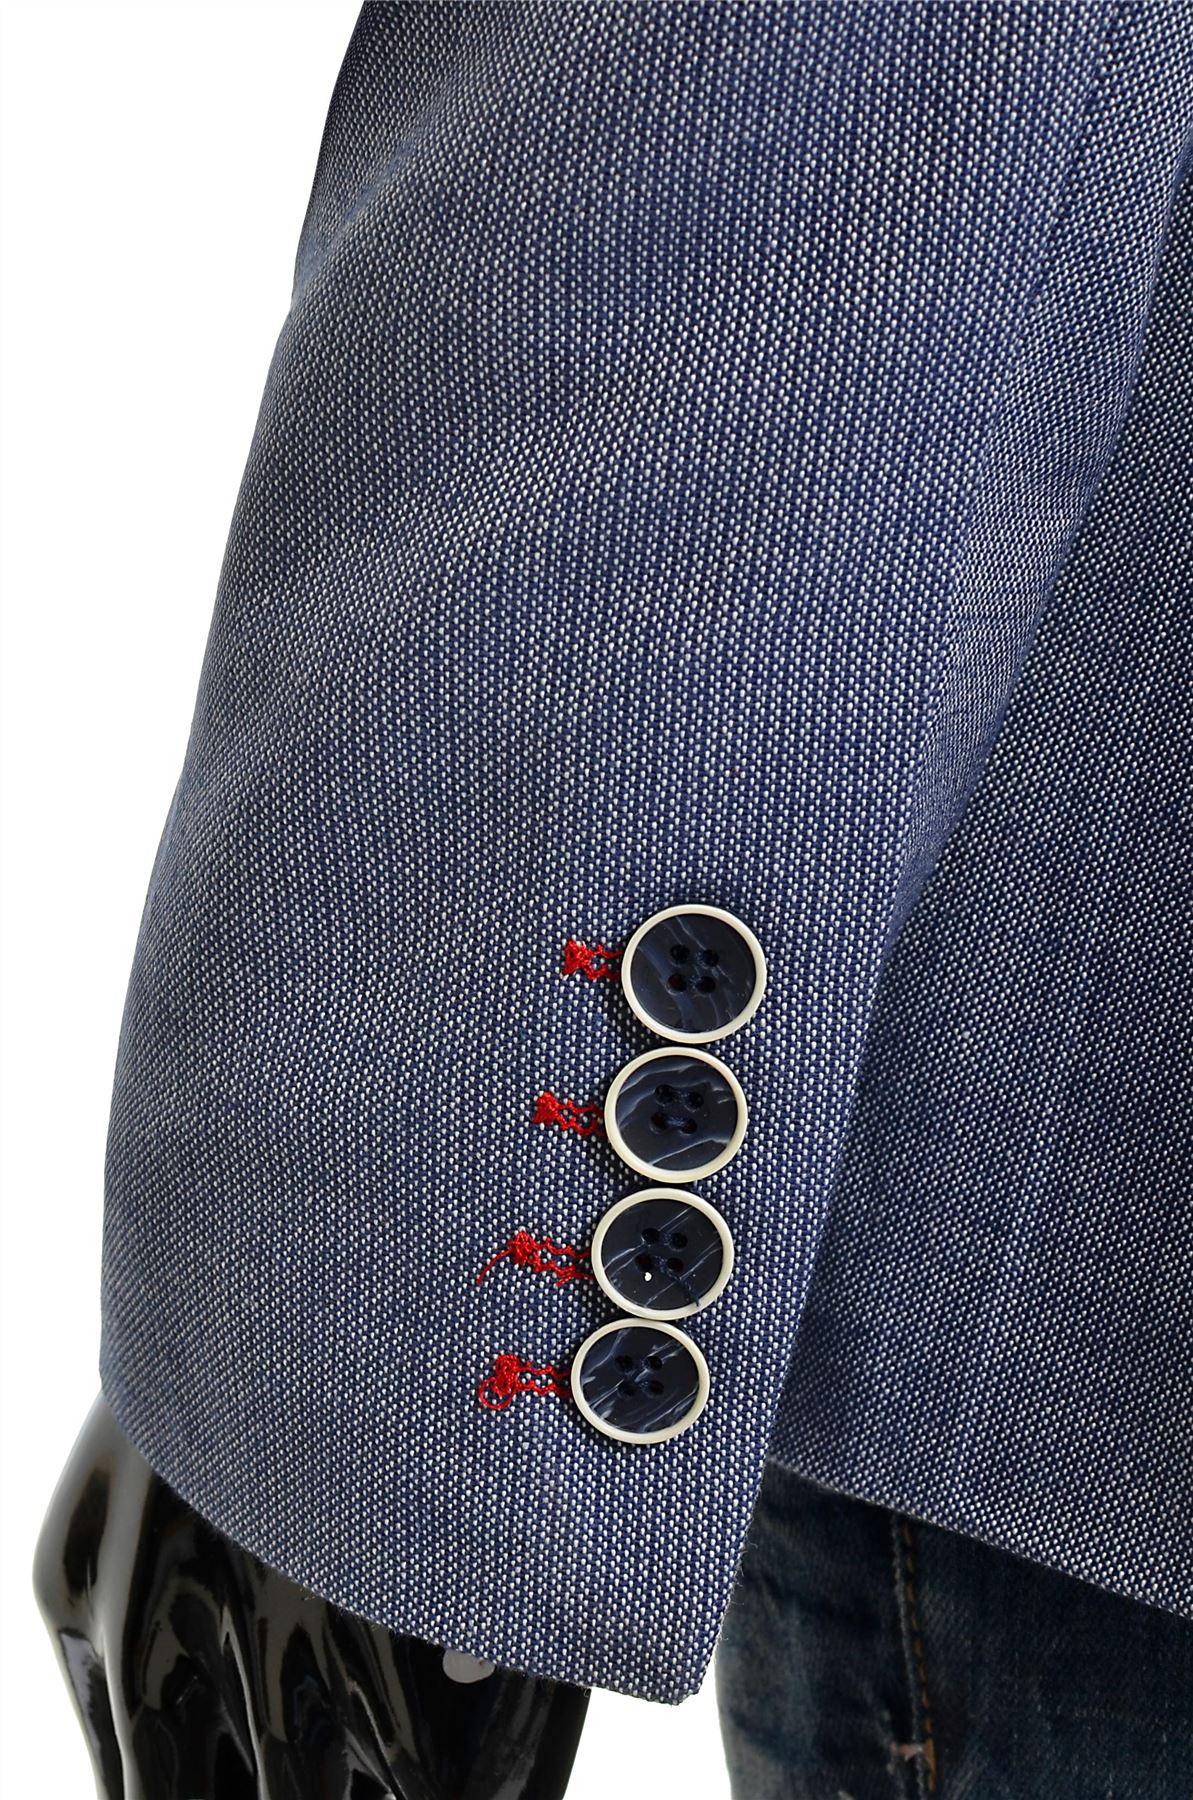 Hombre-Clasicos-Blazer-Chaqueta-Azul-Casual-Calce-cenido-acabado-rojo-de-negocios-de-algodon-suave